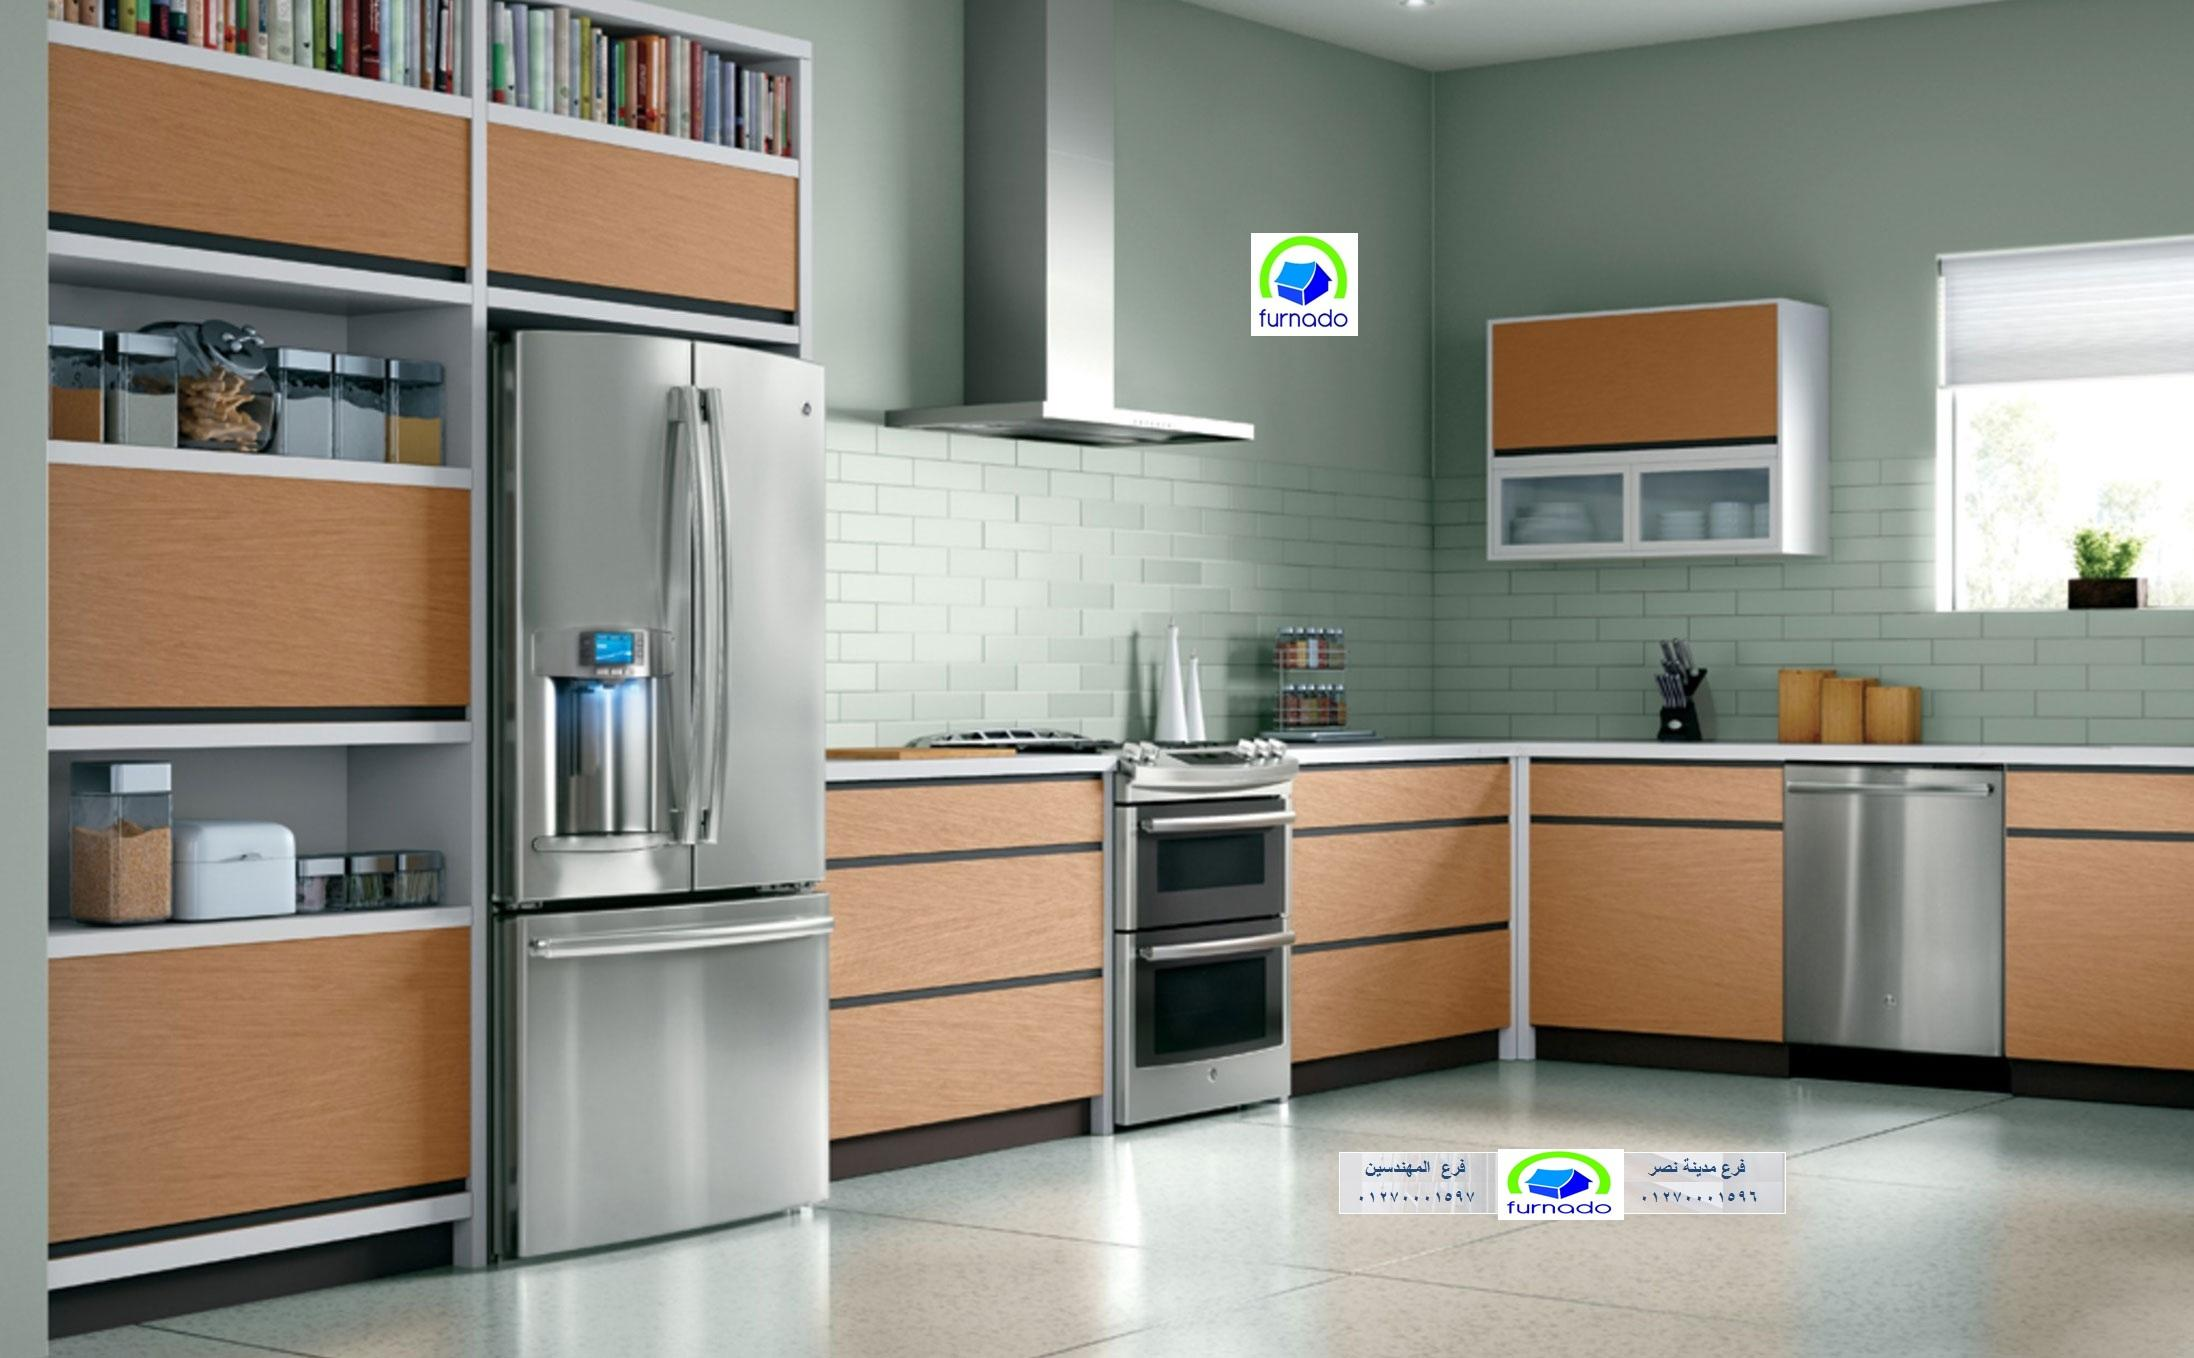 مطابخ hpl  – افضل سعر مطبخ خشب    01270001596 130211806